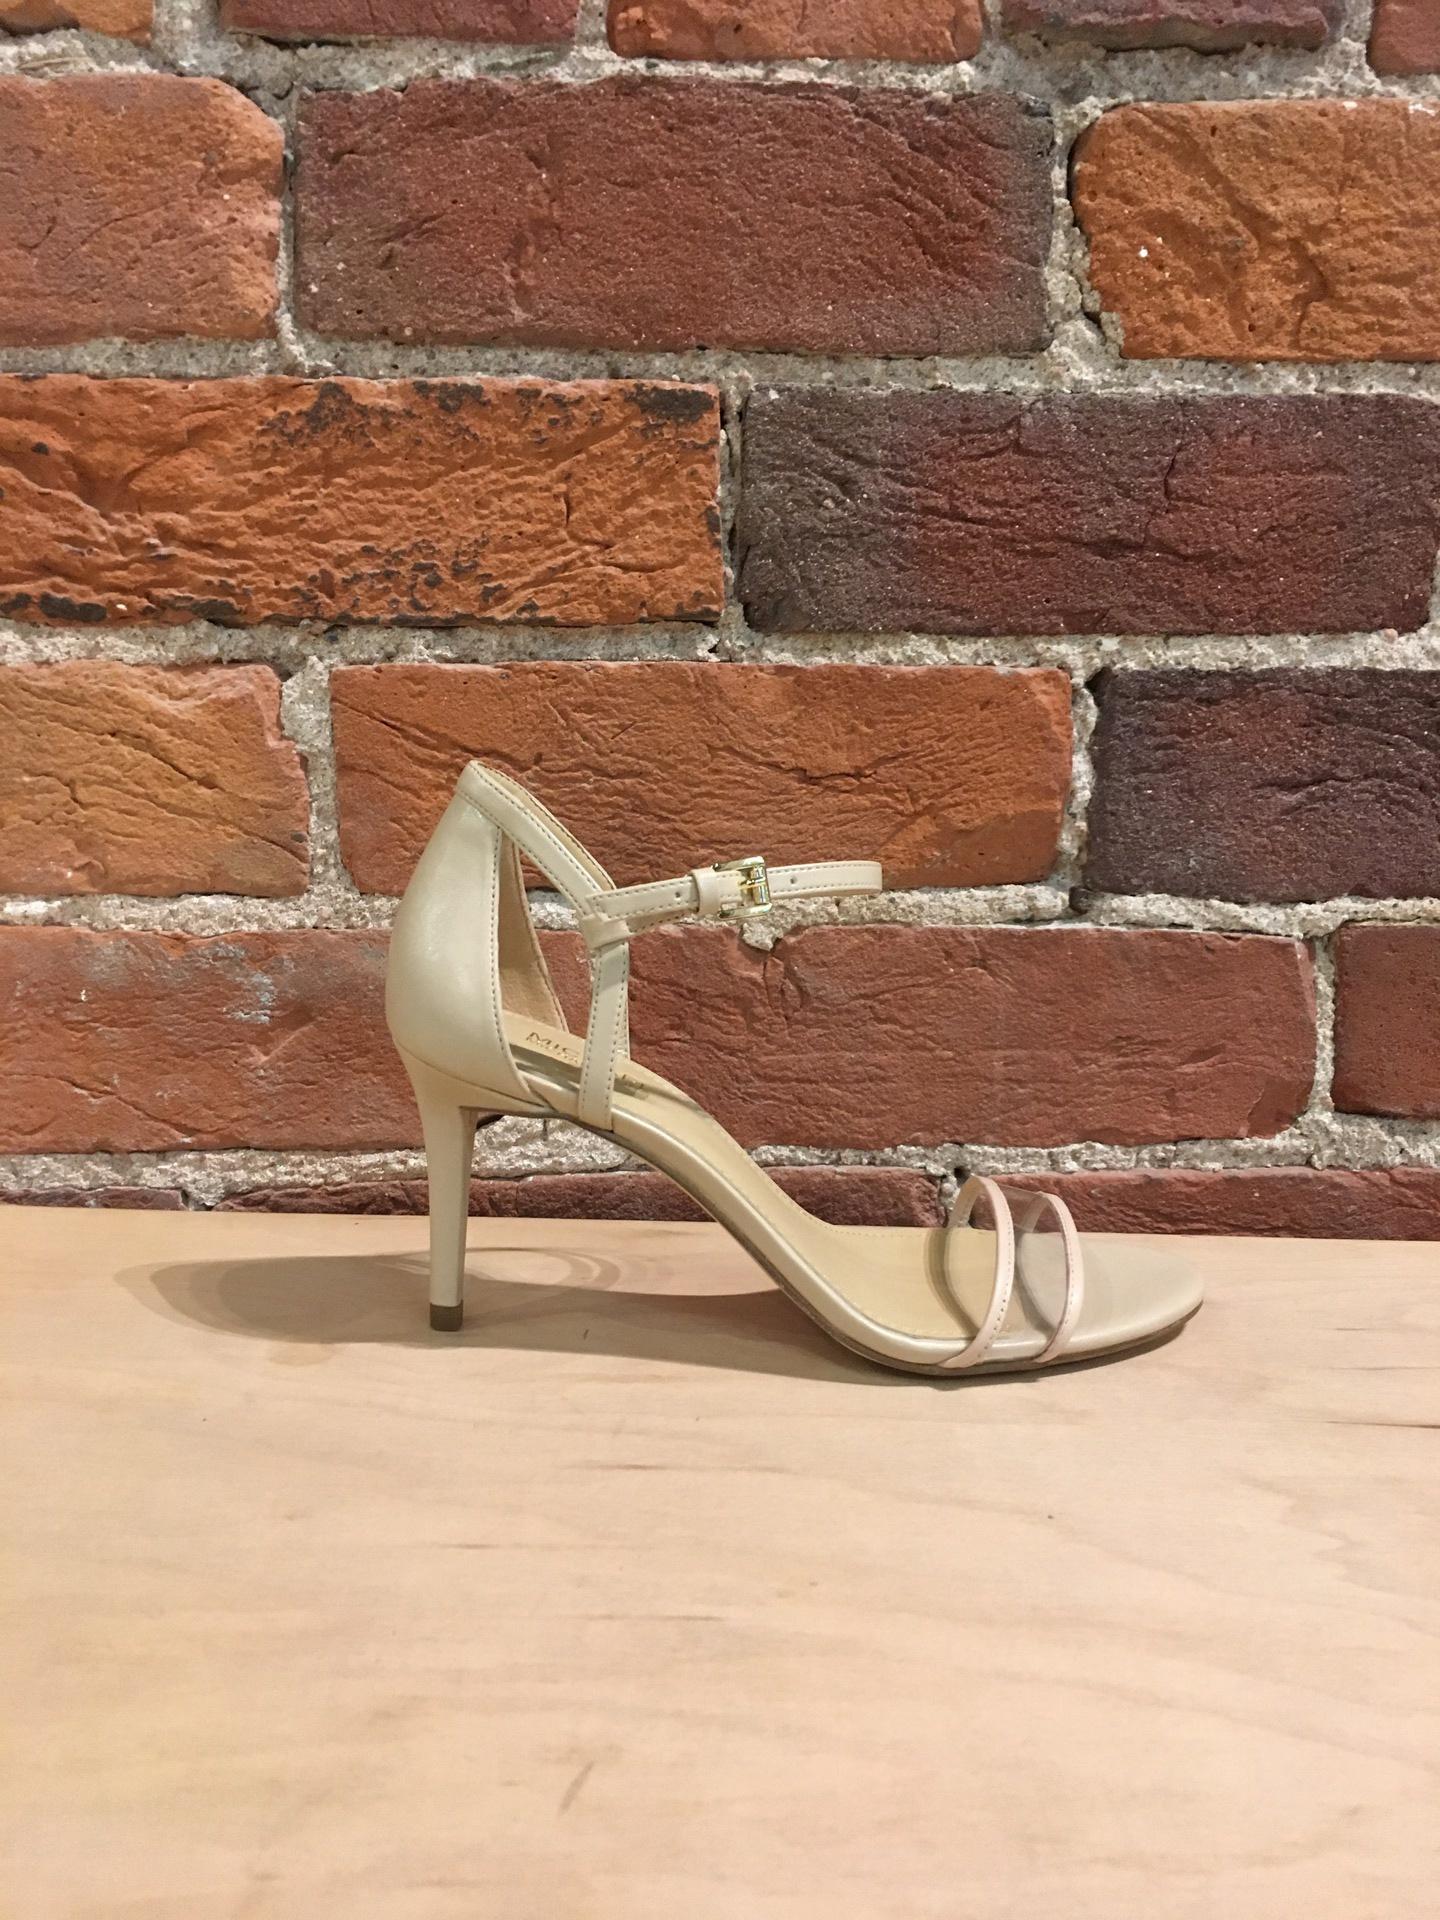 a70733b6ff2d MICHAEL KORS - SIMONE MID SANDAL IN OYSTER - the Urban Shoe Myth